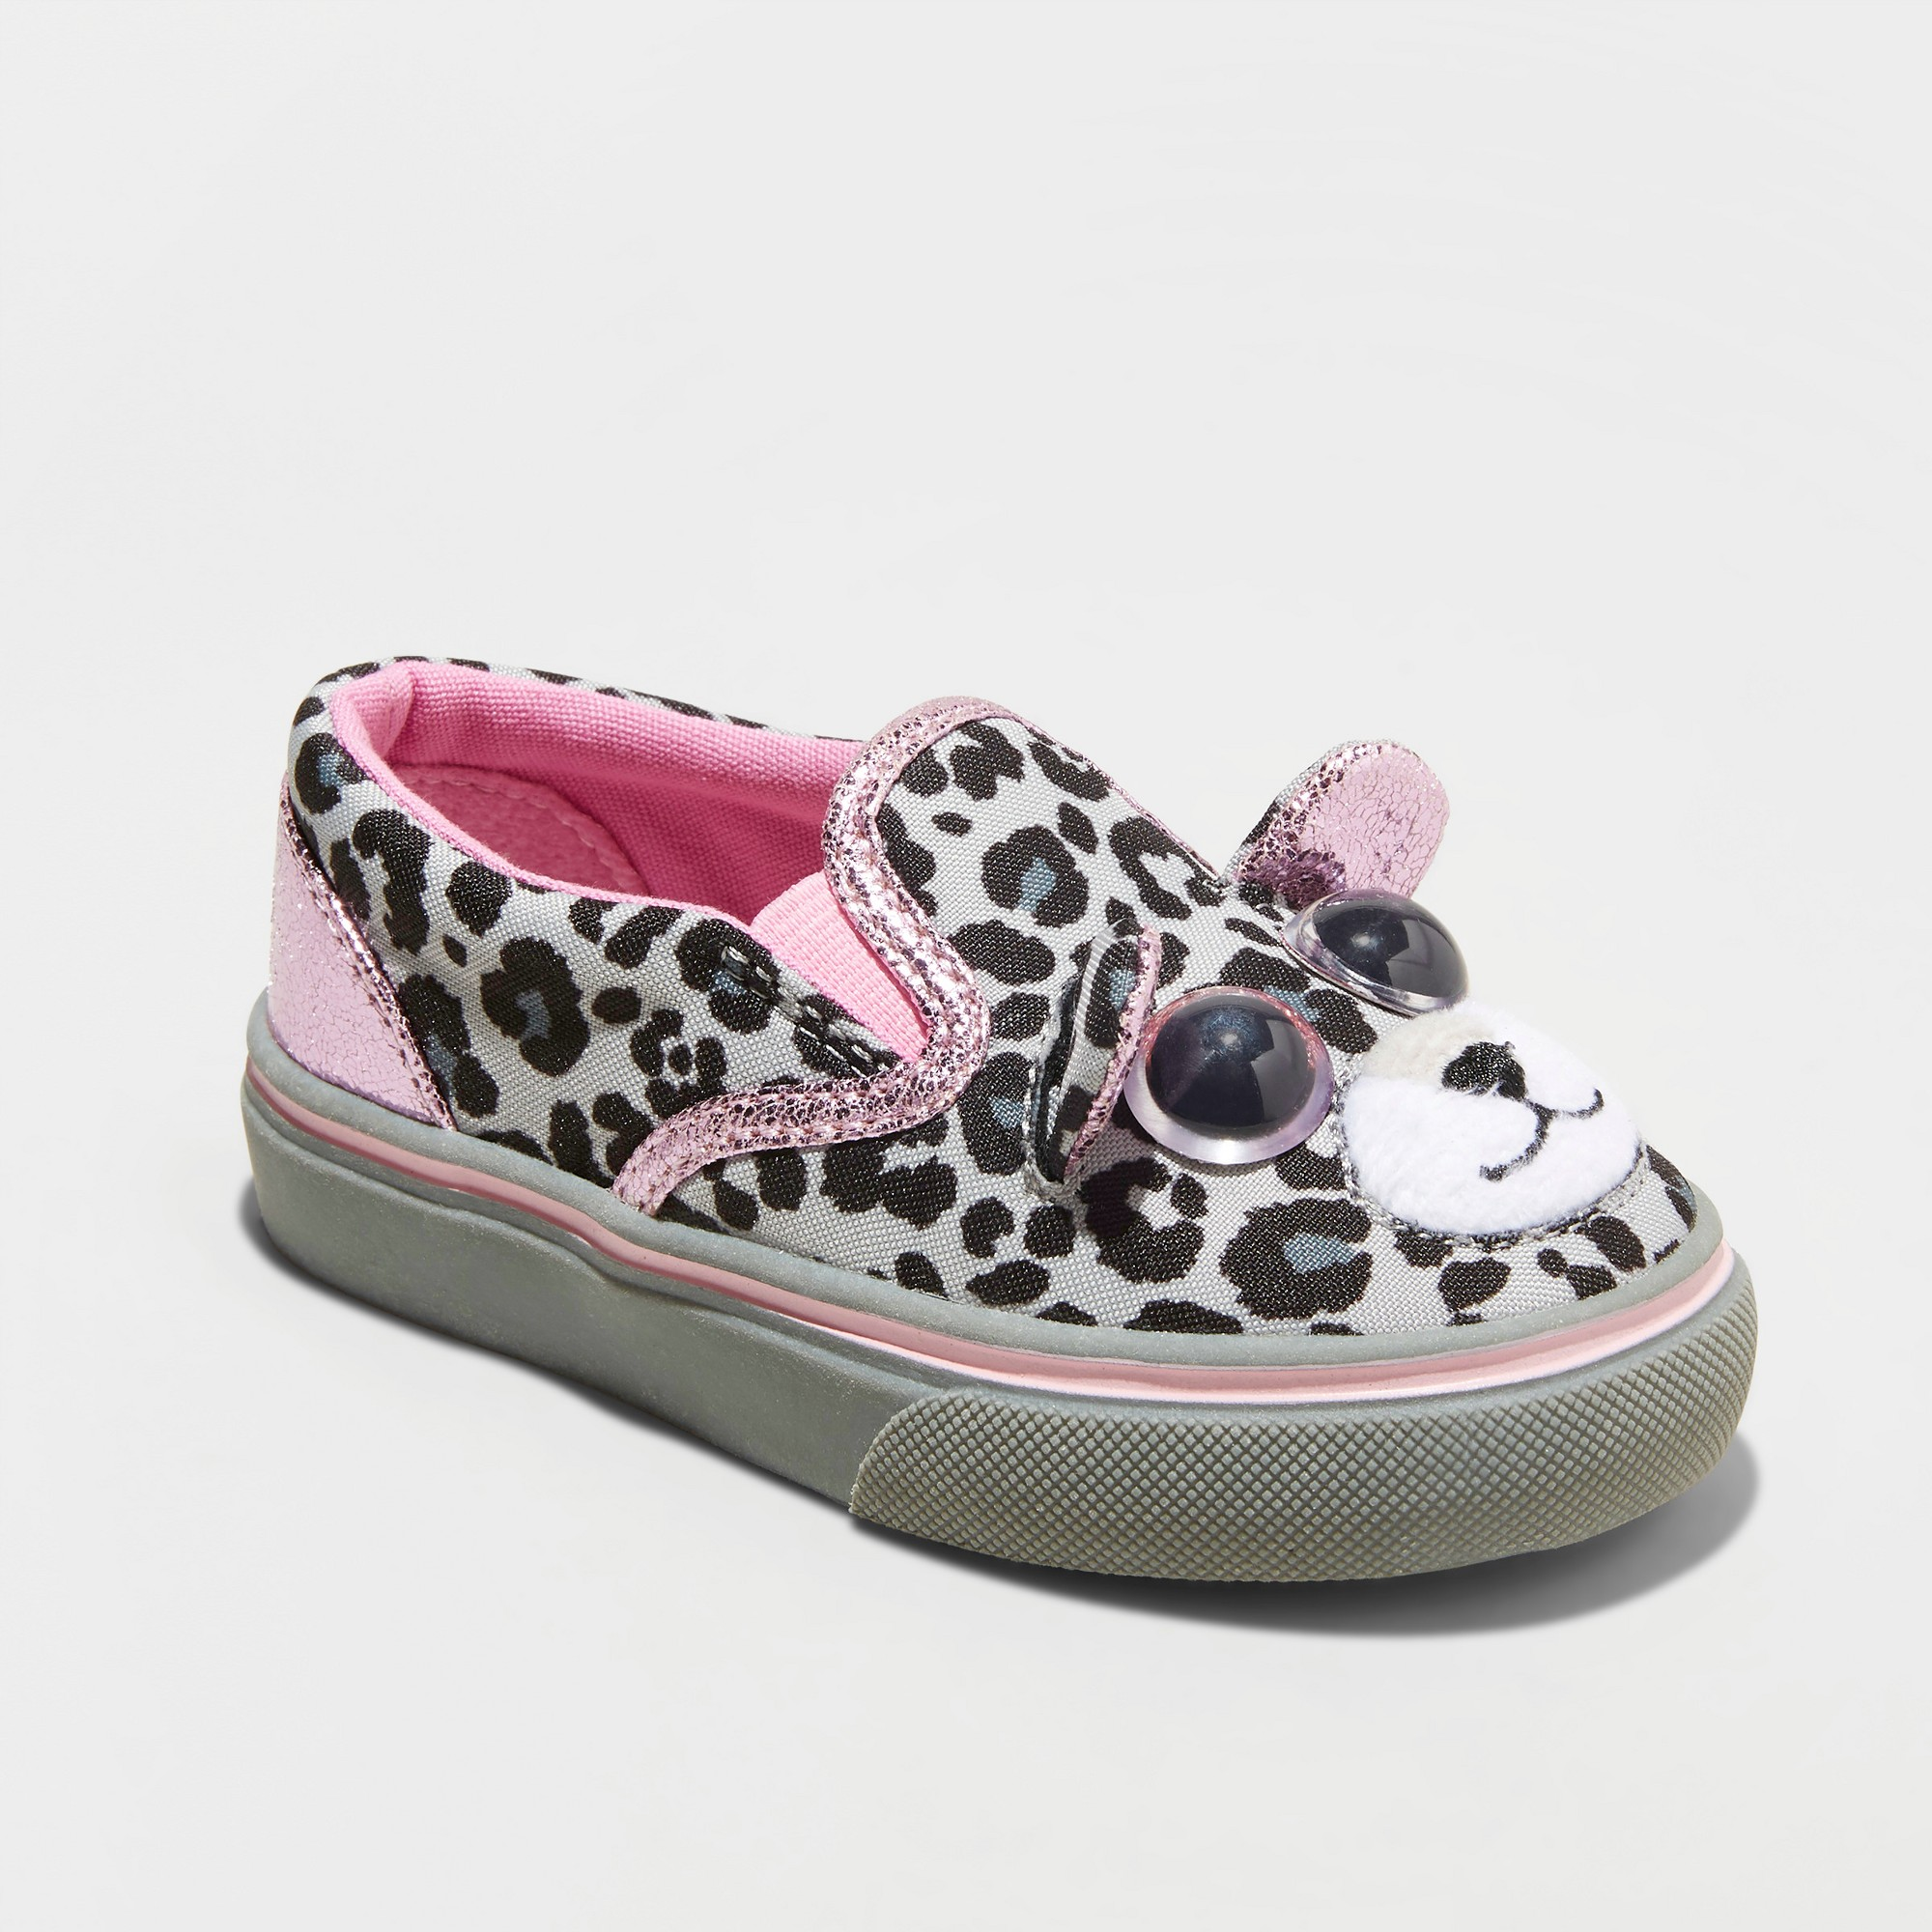 261419b8d25b Toddler Girls  Jumparoos Leopard Slip on Sneakers - Gray 11 ...